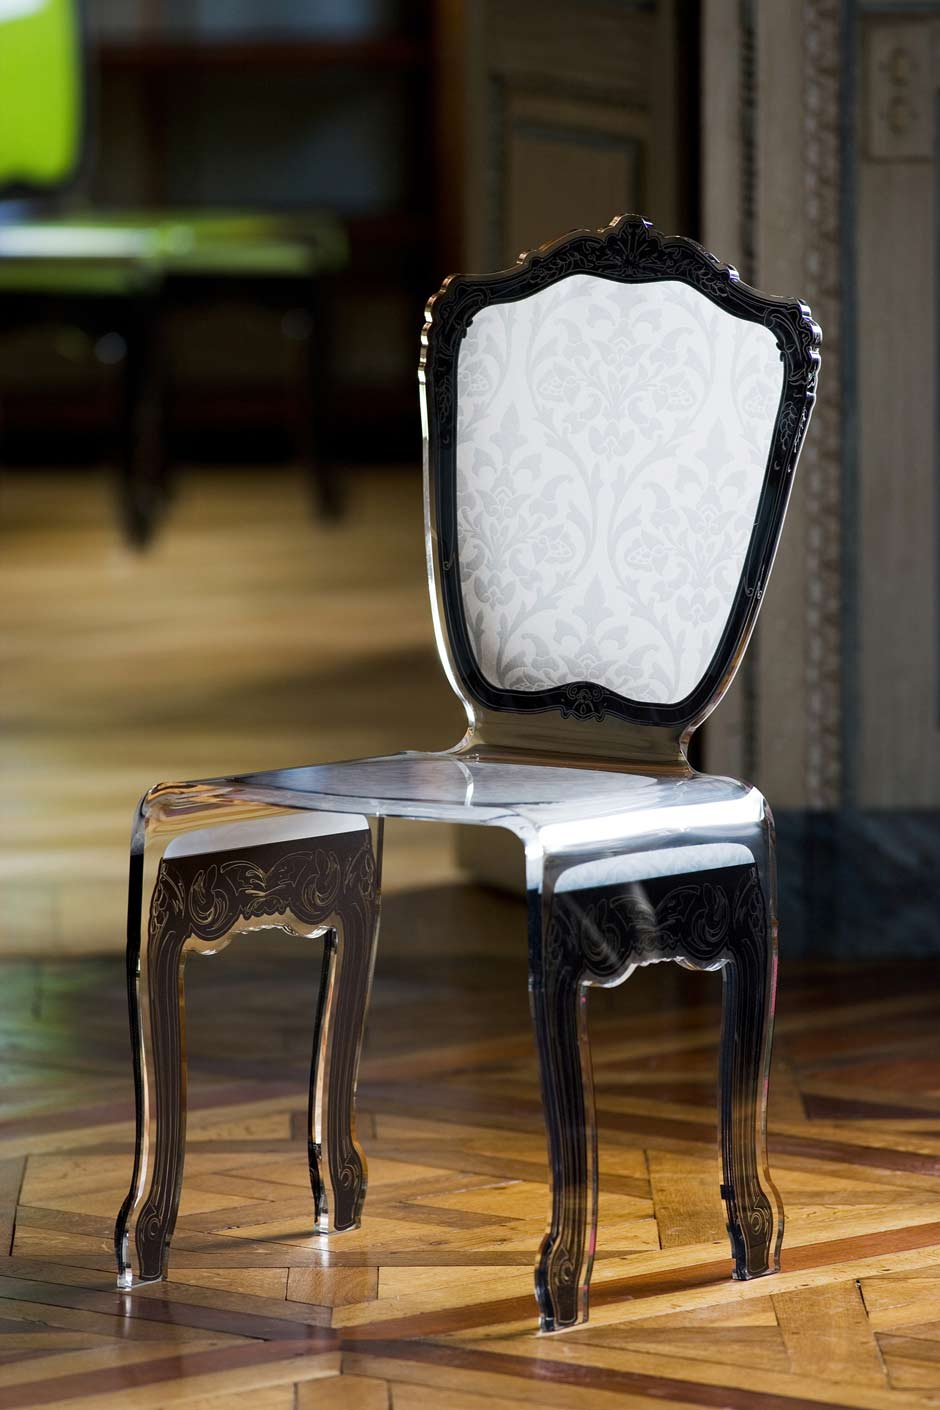 chaise baroque plexiglas motif blanc acrila sp cialiste du plexiglas r f 11030351. Black Bedroom Furniture Sets. Home Design Ideas